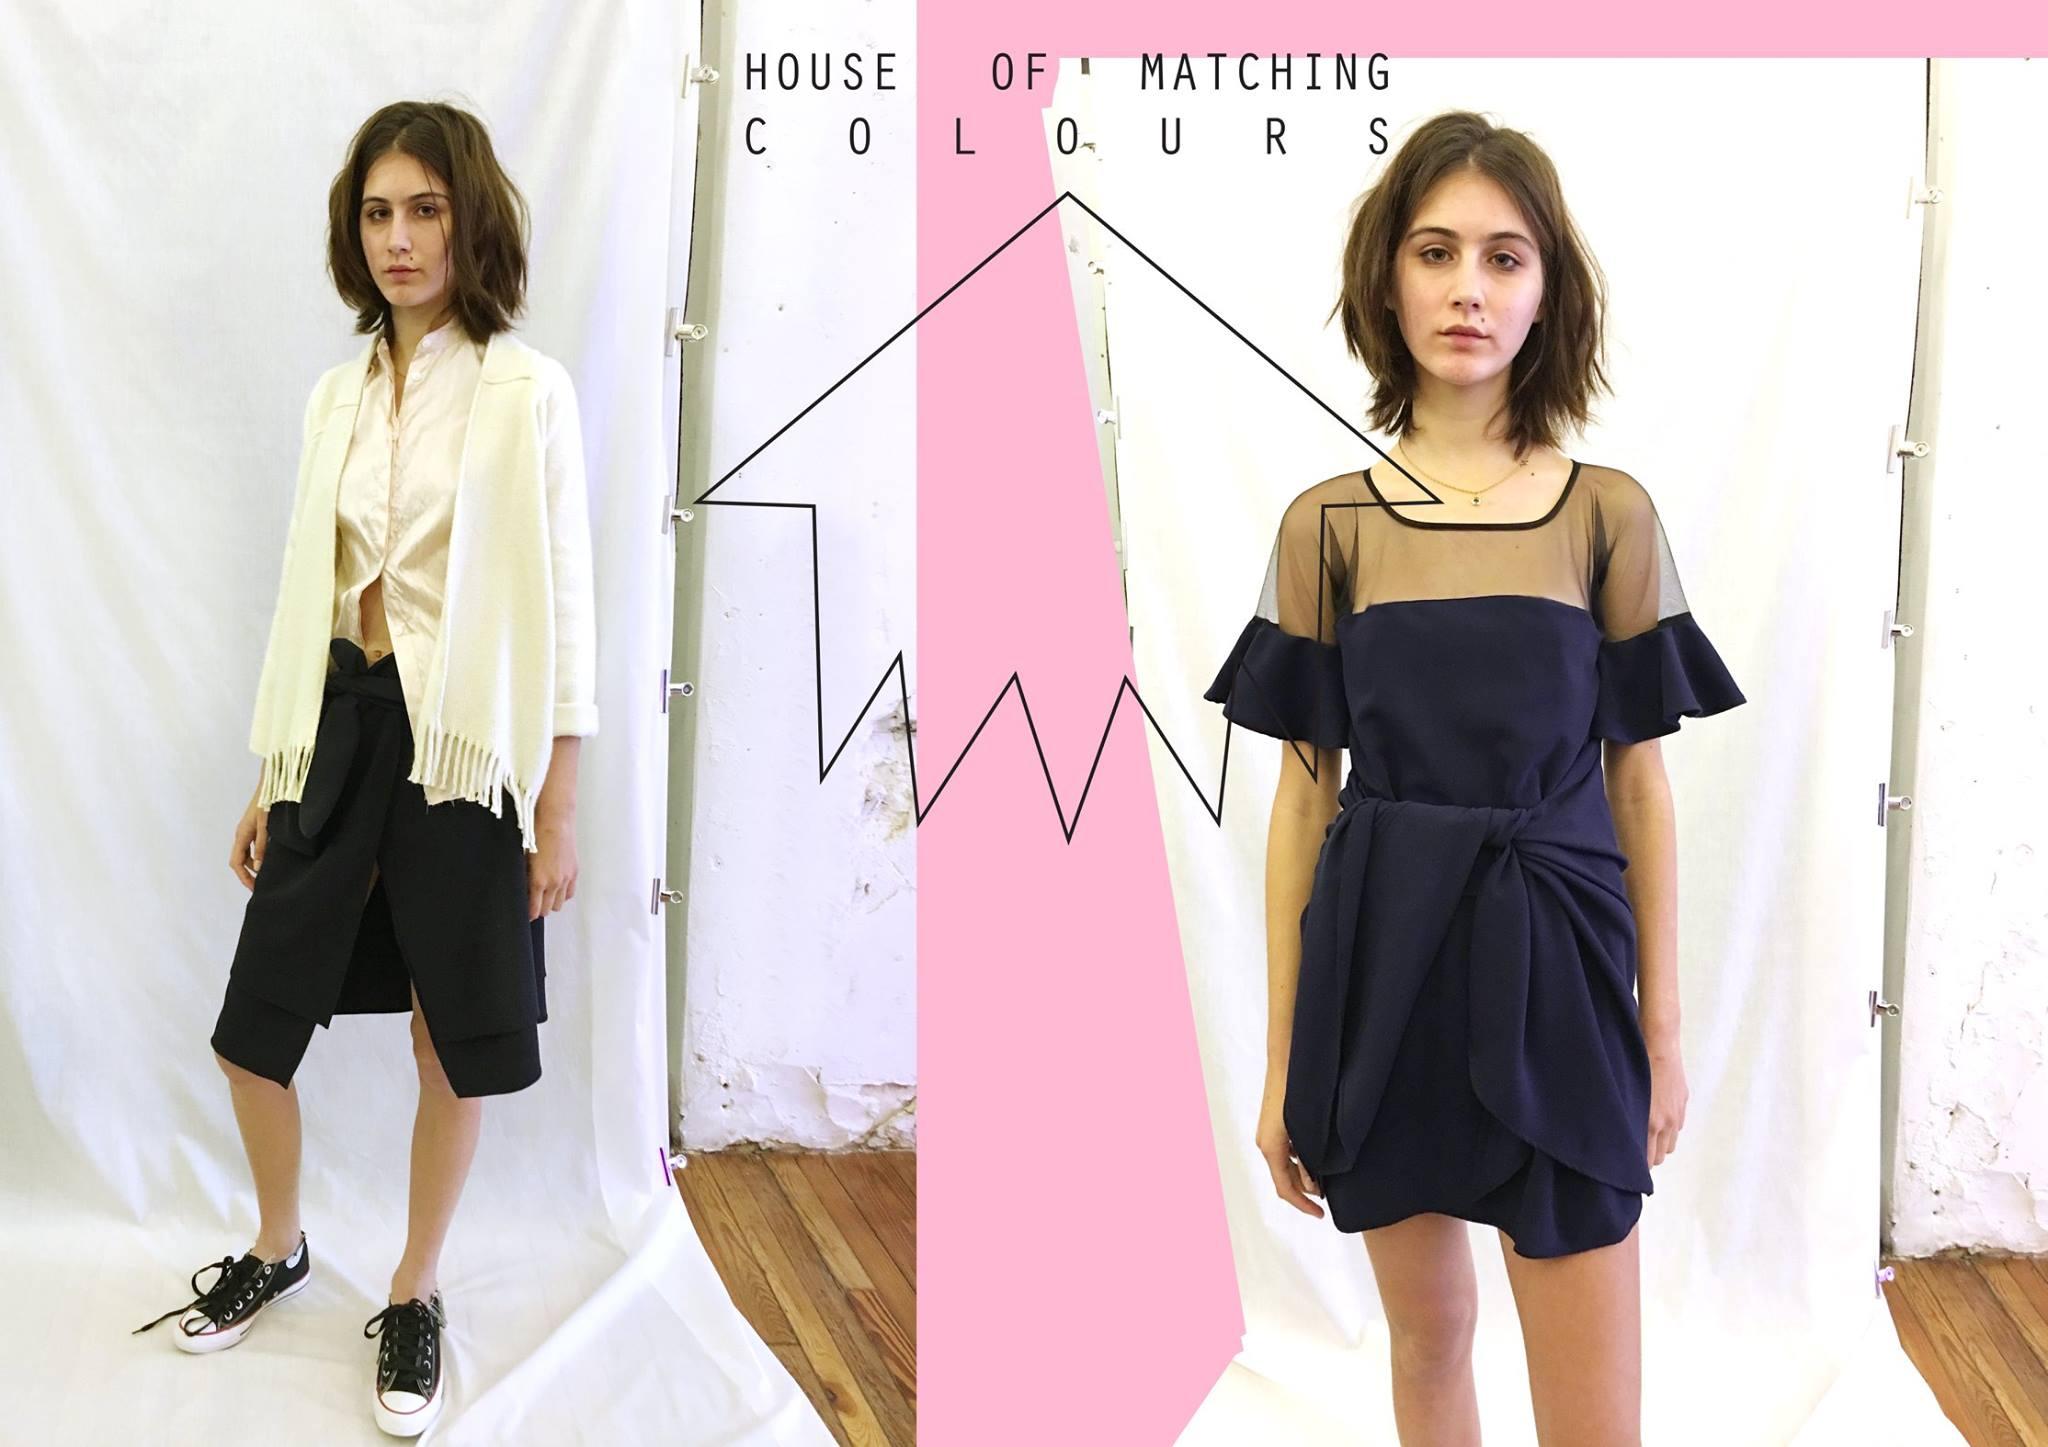 House of Matching Colours y el encaje perfecto